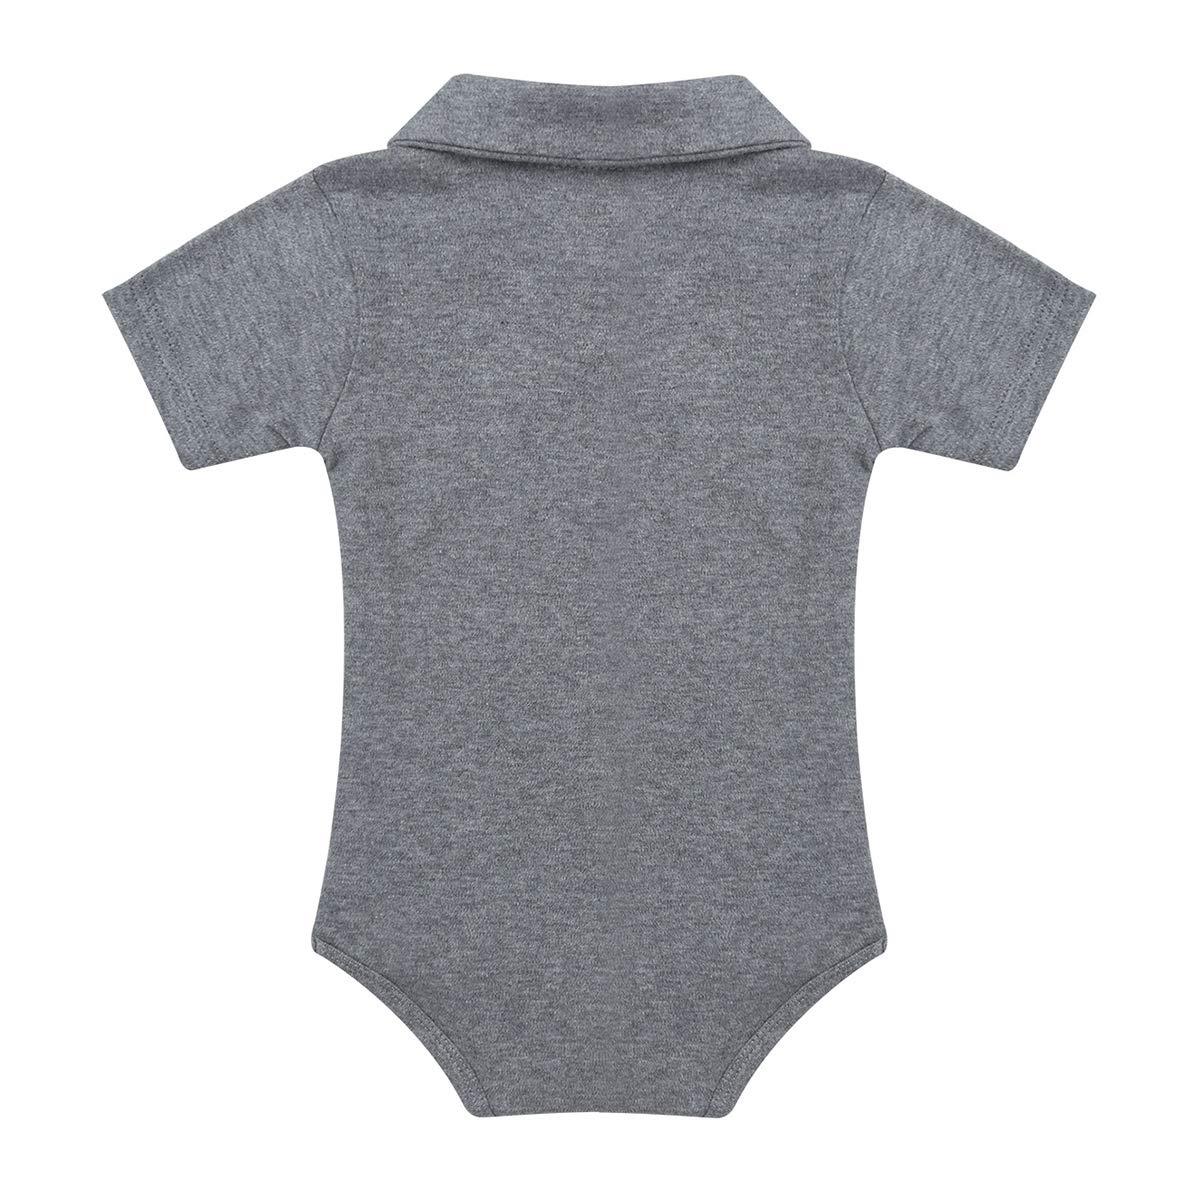 inlzdz Infant Baby Boys One Piece Cotton Short Sleeves Bodysuit T Shirts Toddler Gentleman Romper Summer Outfits